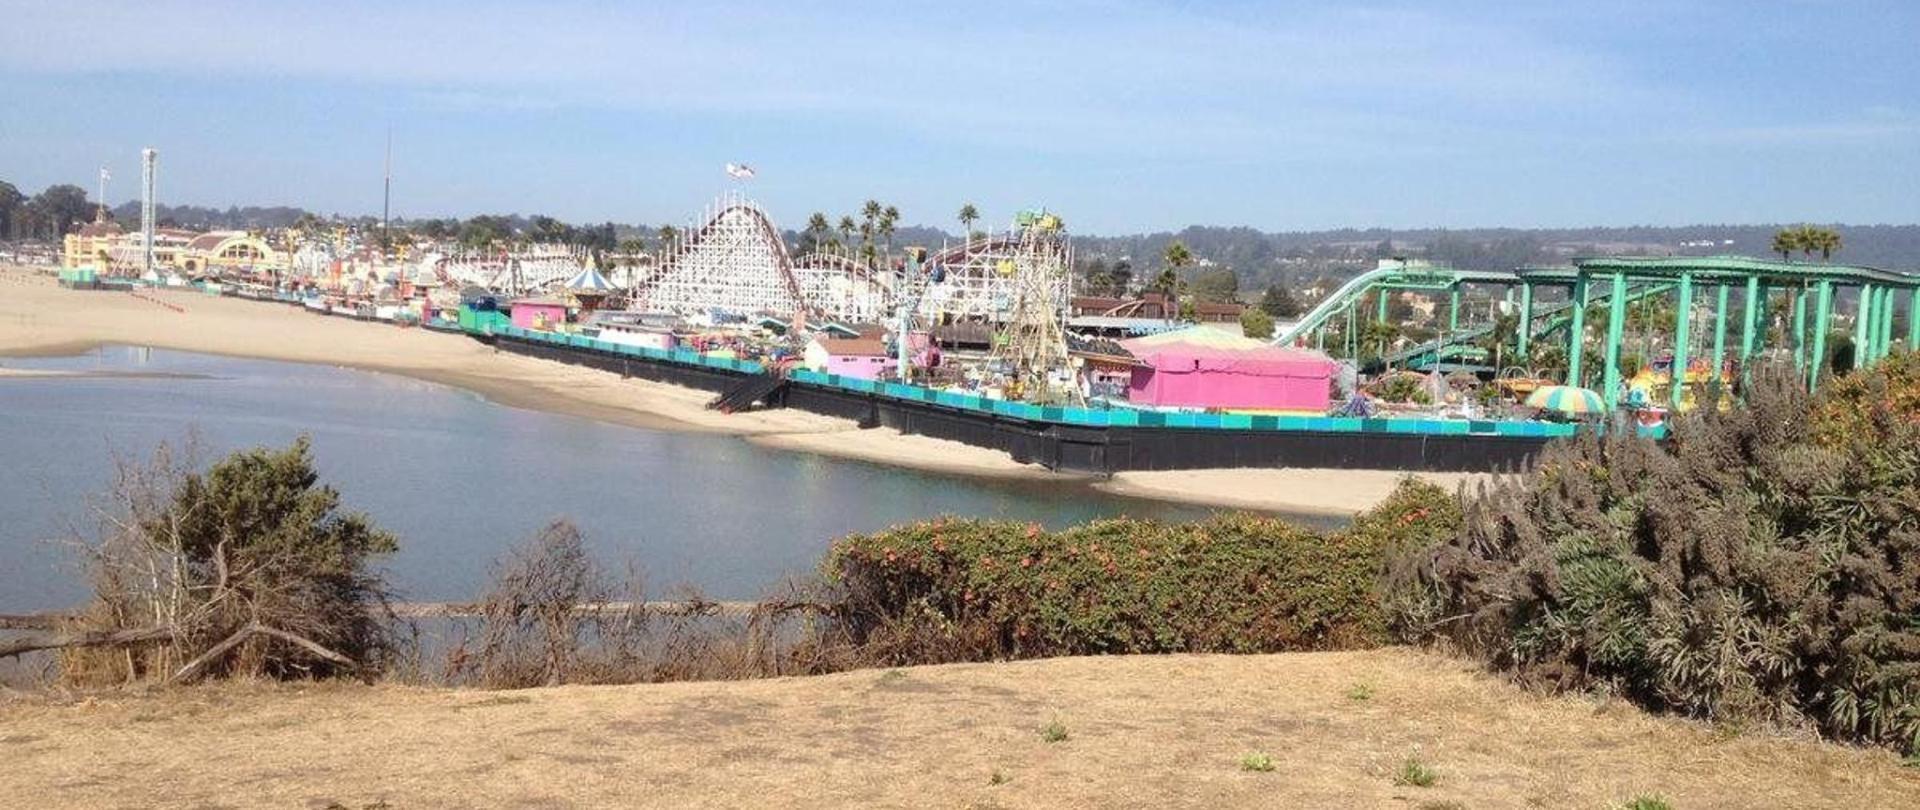 Walking Distance to Santa Cruz Boardwalk